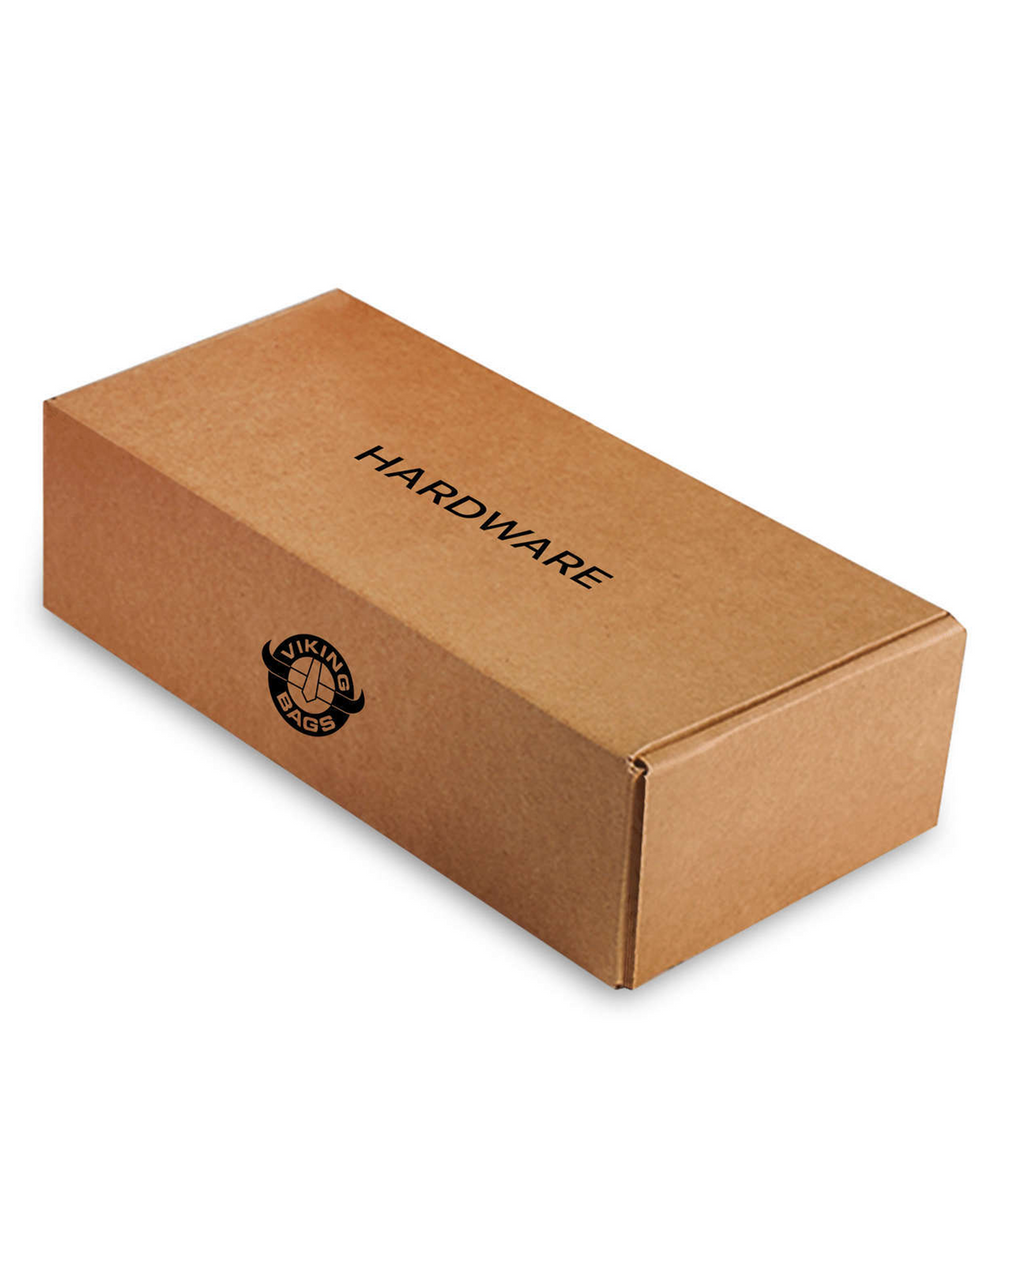 Honda 750 Shadow Aero Charger Single Strap Medium Motorcycle Saddlebags Box